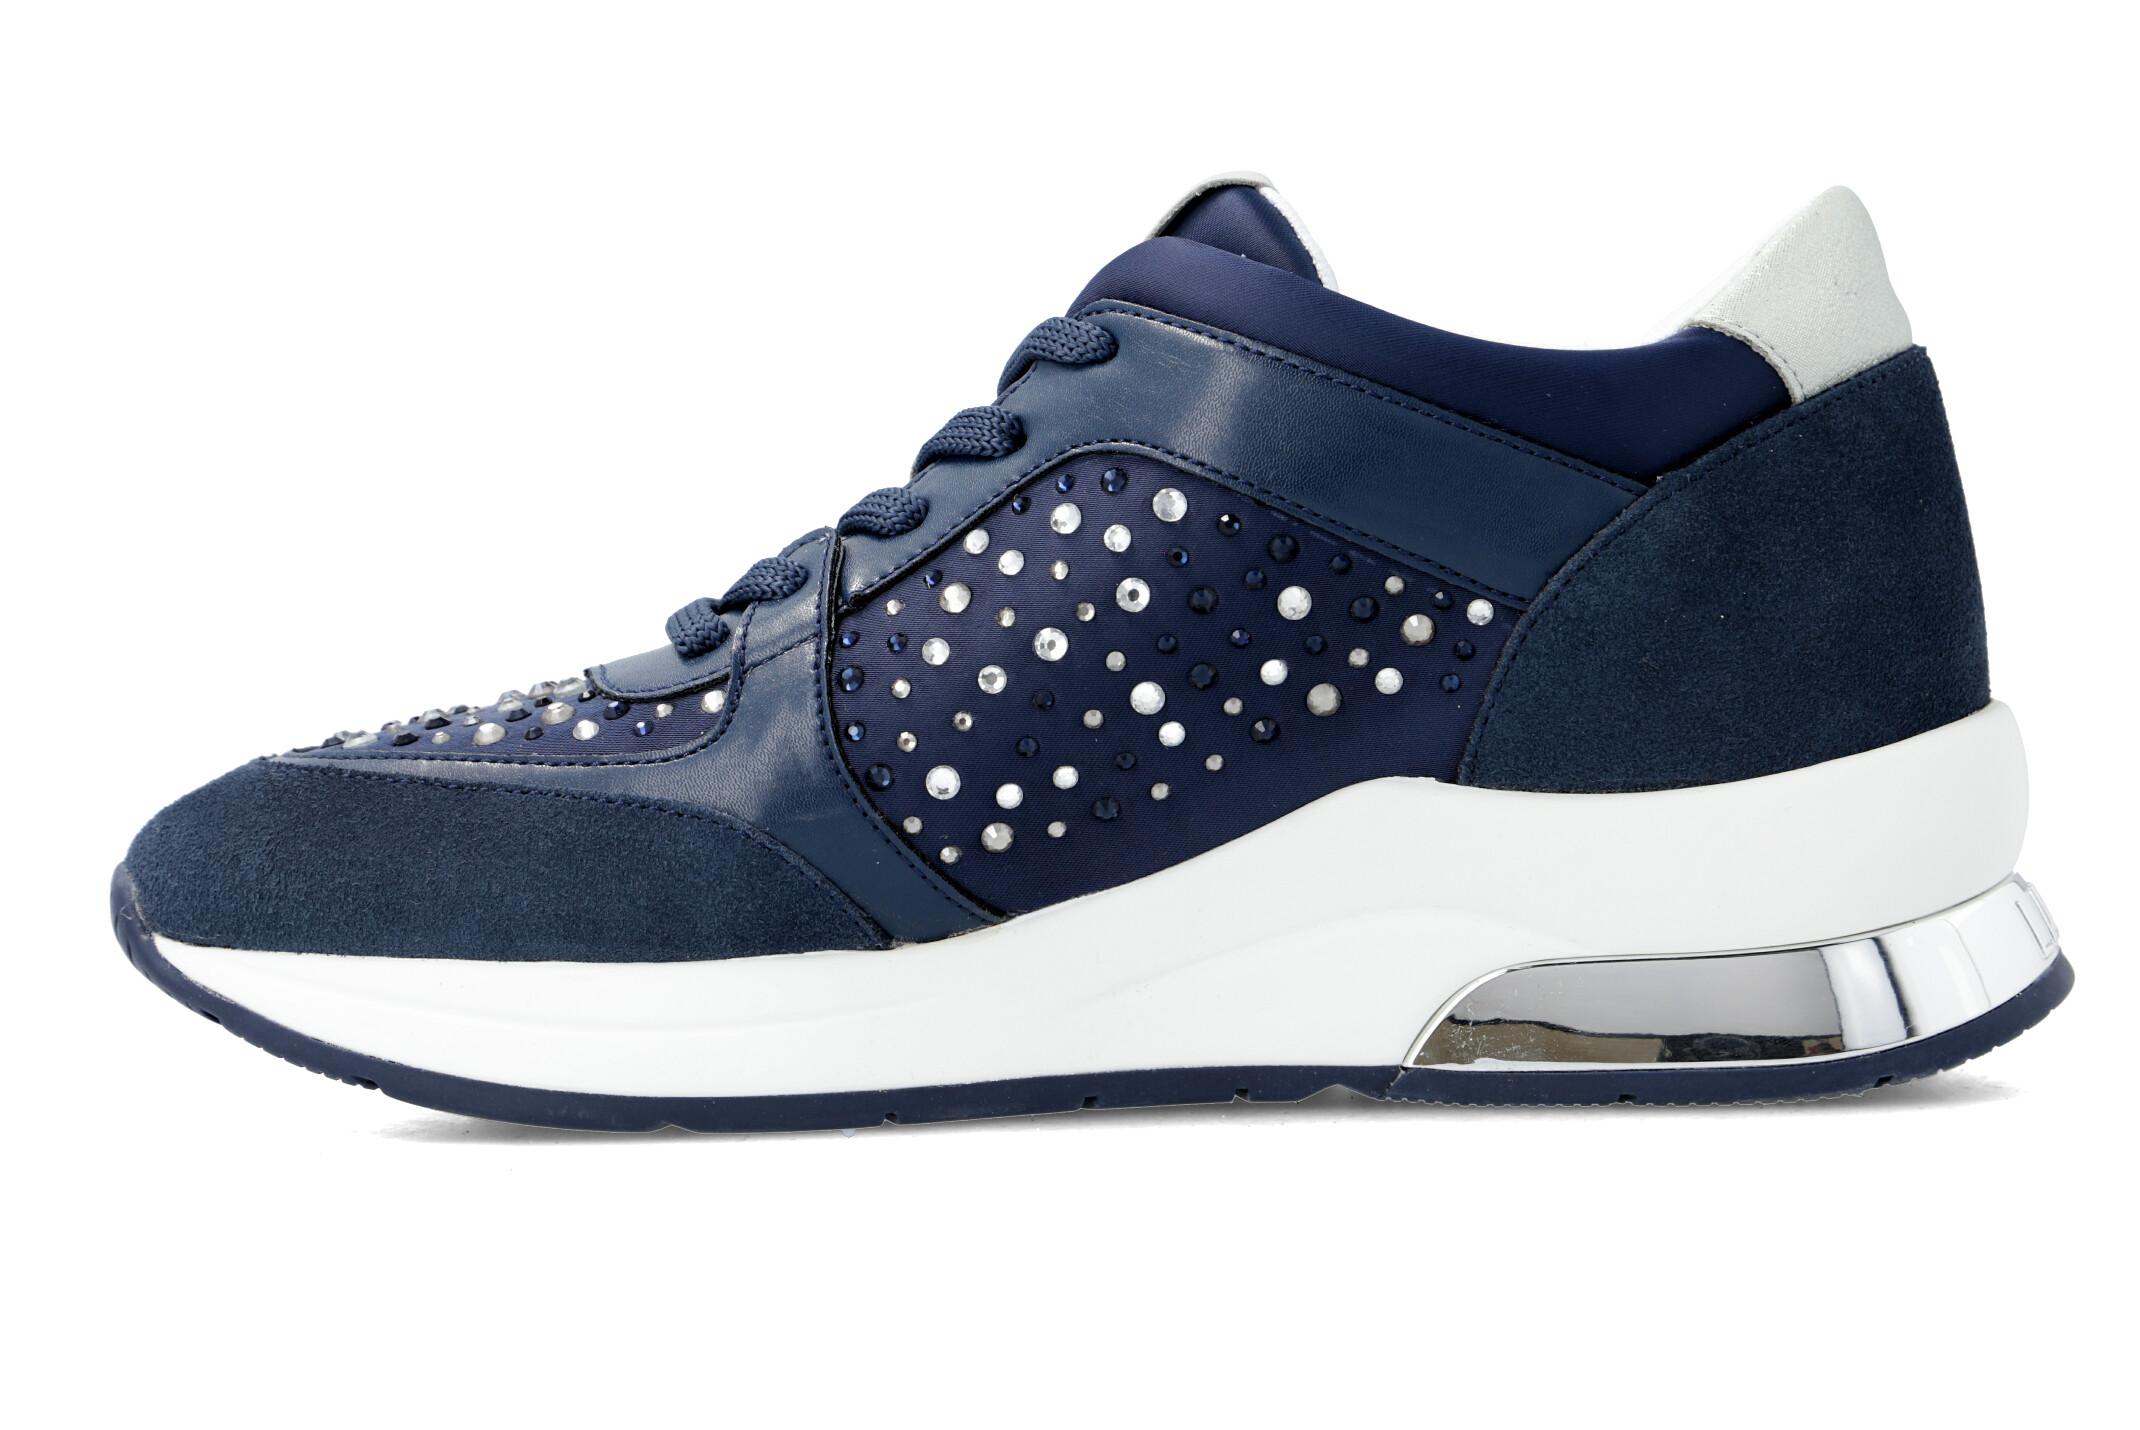 Liu 12 NavySne Karlie Jo sneaker Shoes ALRq5c34j